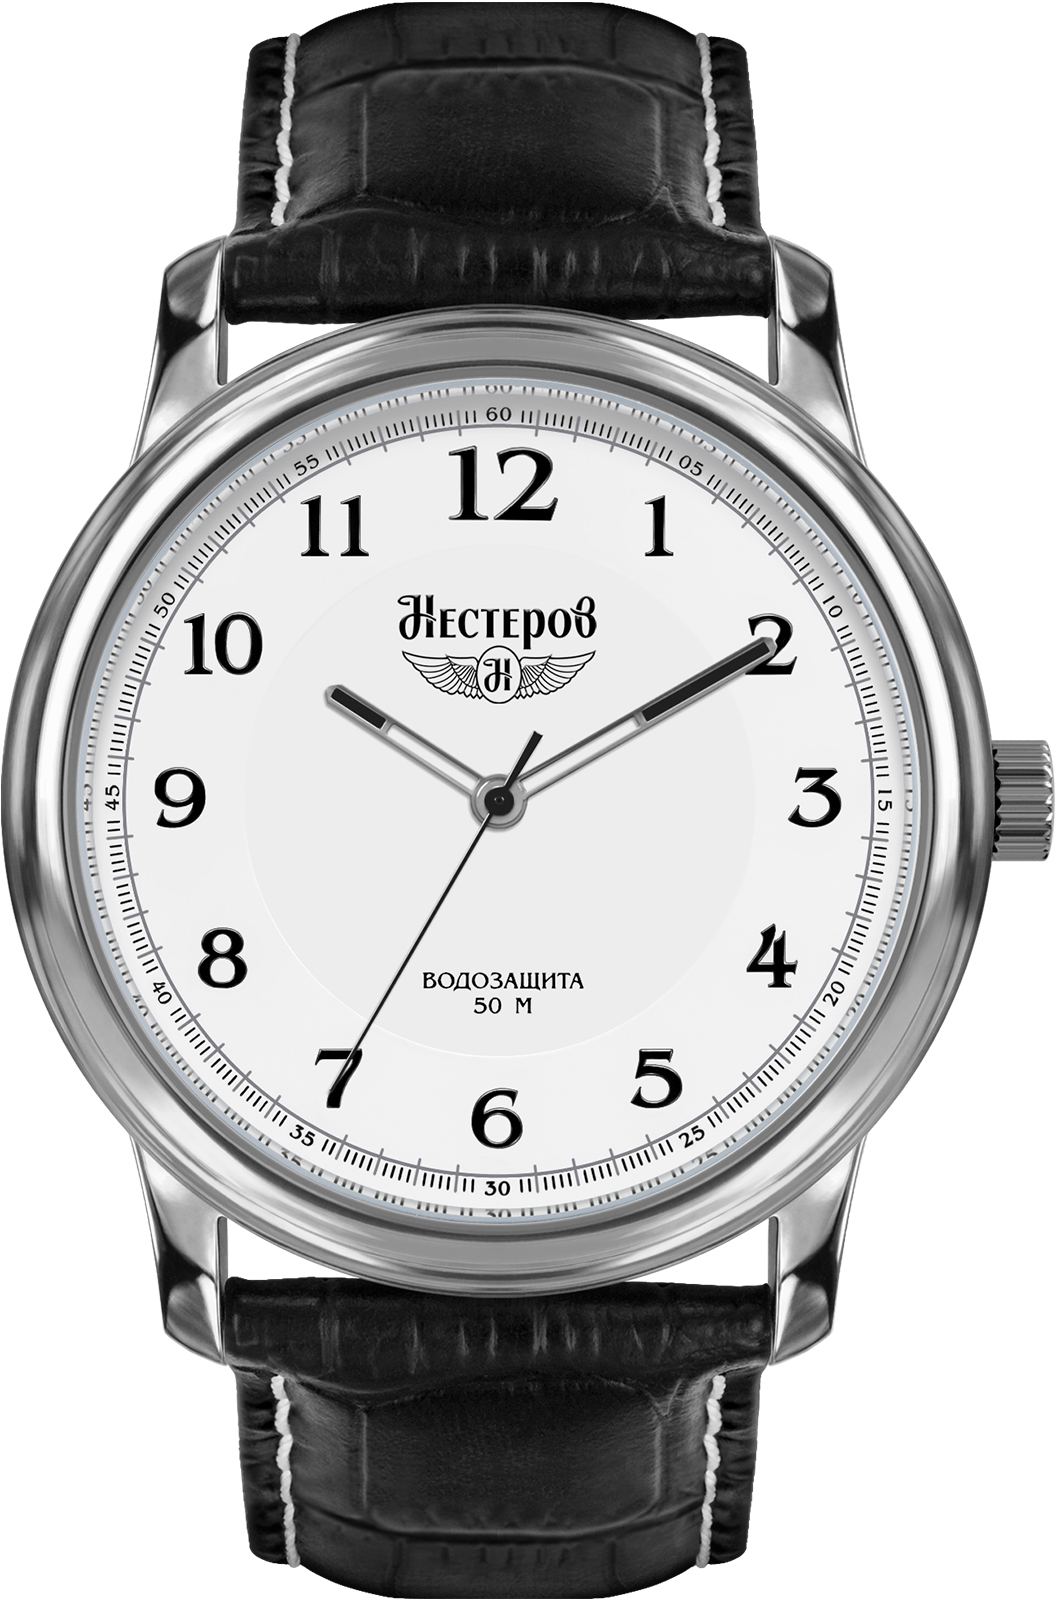 Часы Нестеров H0282B02-01A, белый цена